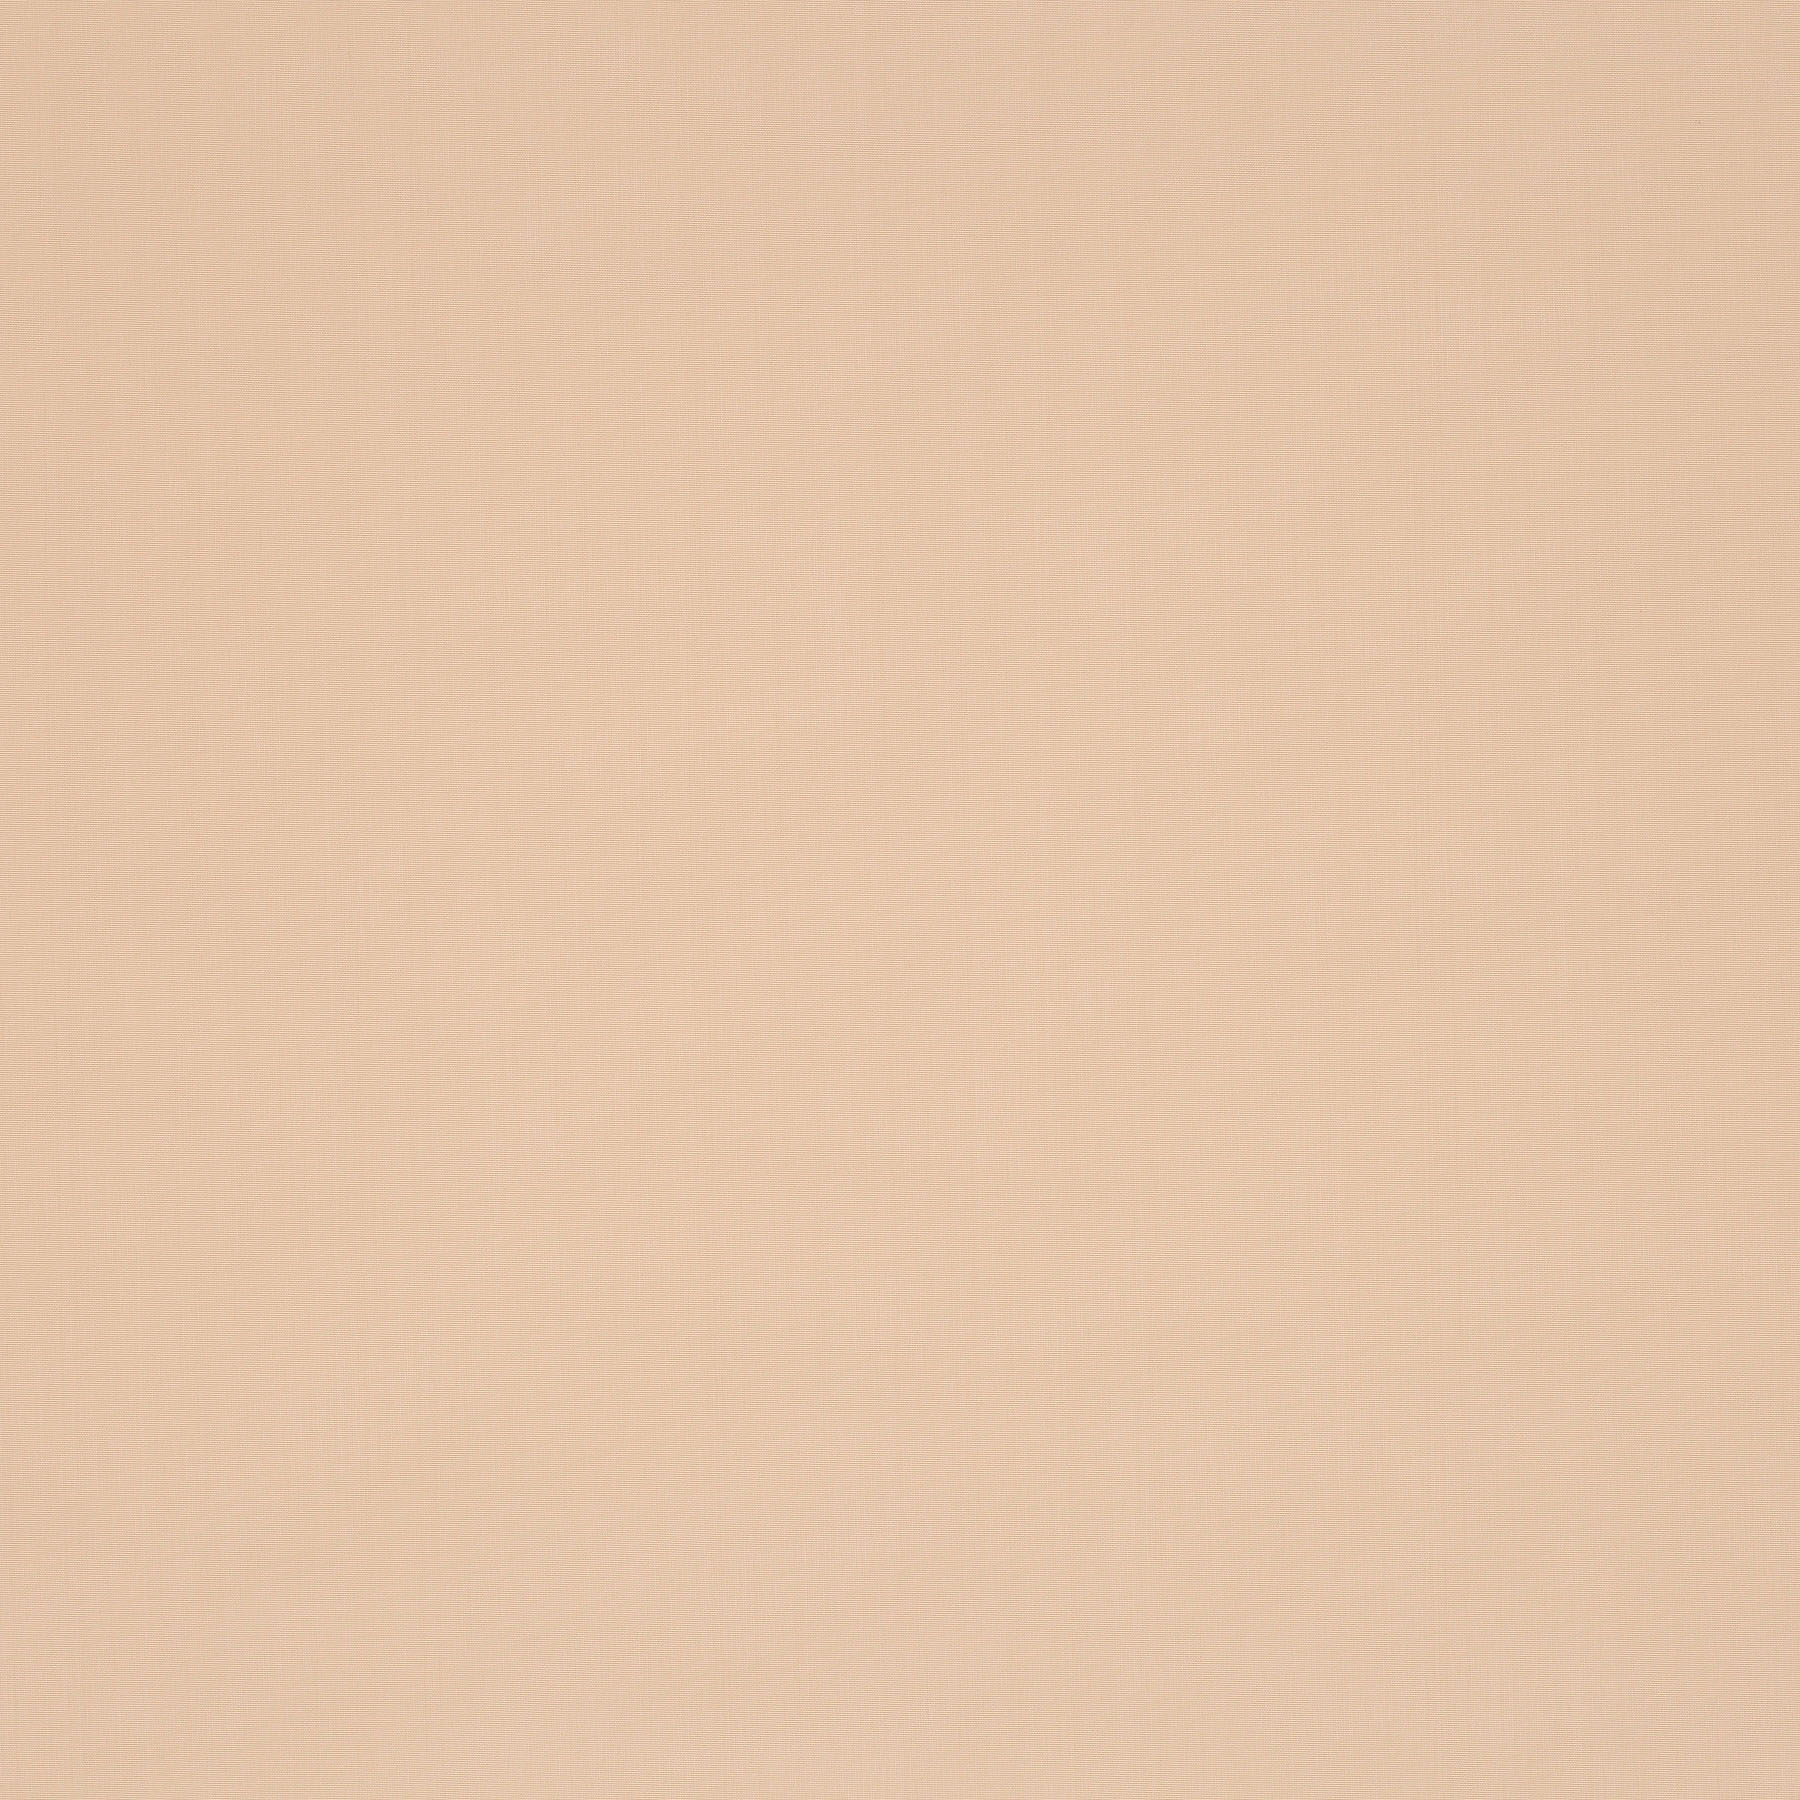 decoration fabric saba vol 3 1 6243 271 jab anstoetz. Black Bedroom Furniture Sets. Home Design Ideas